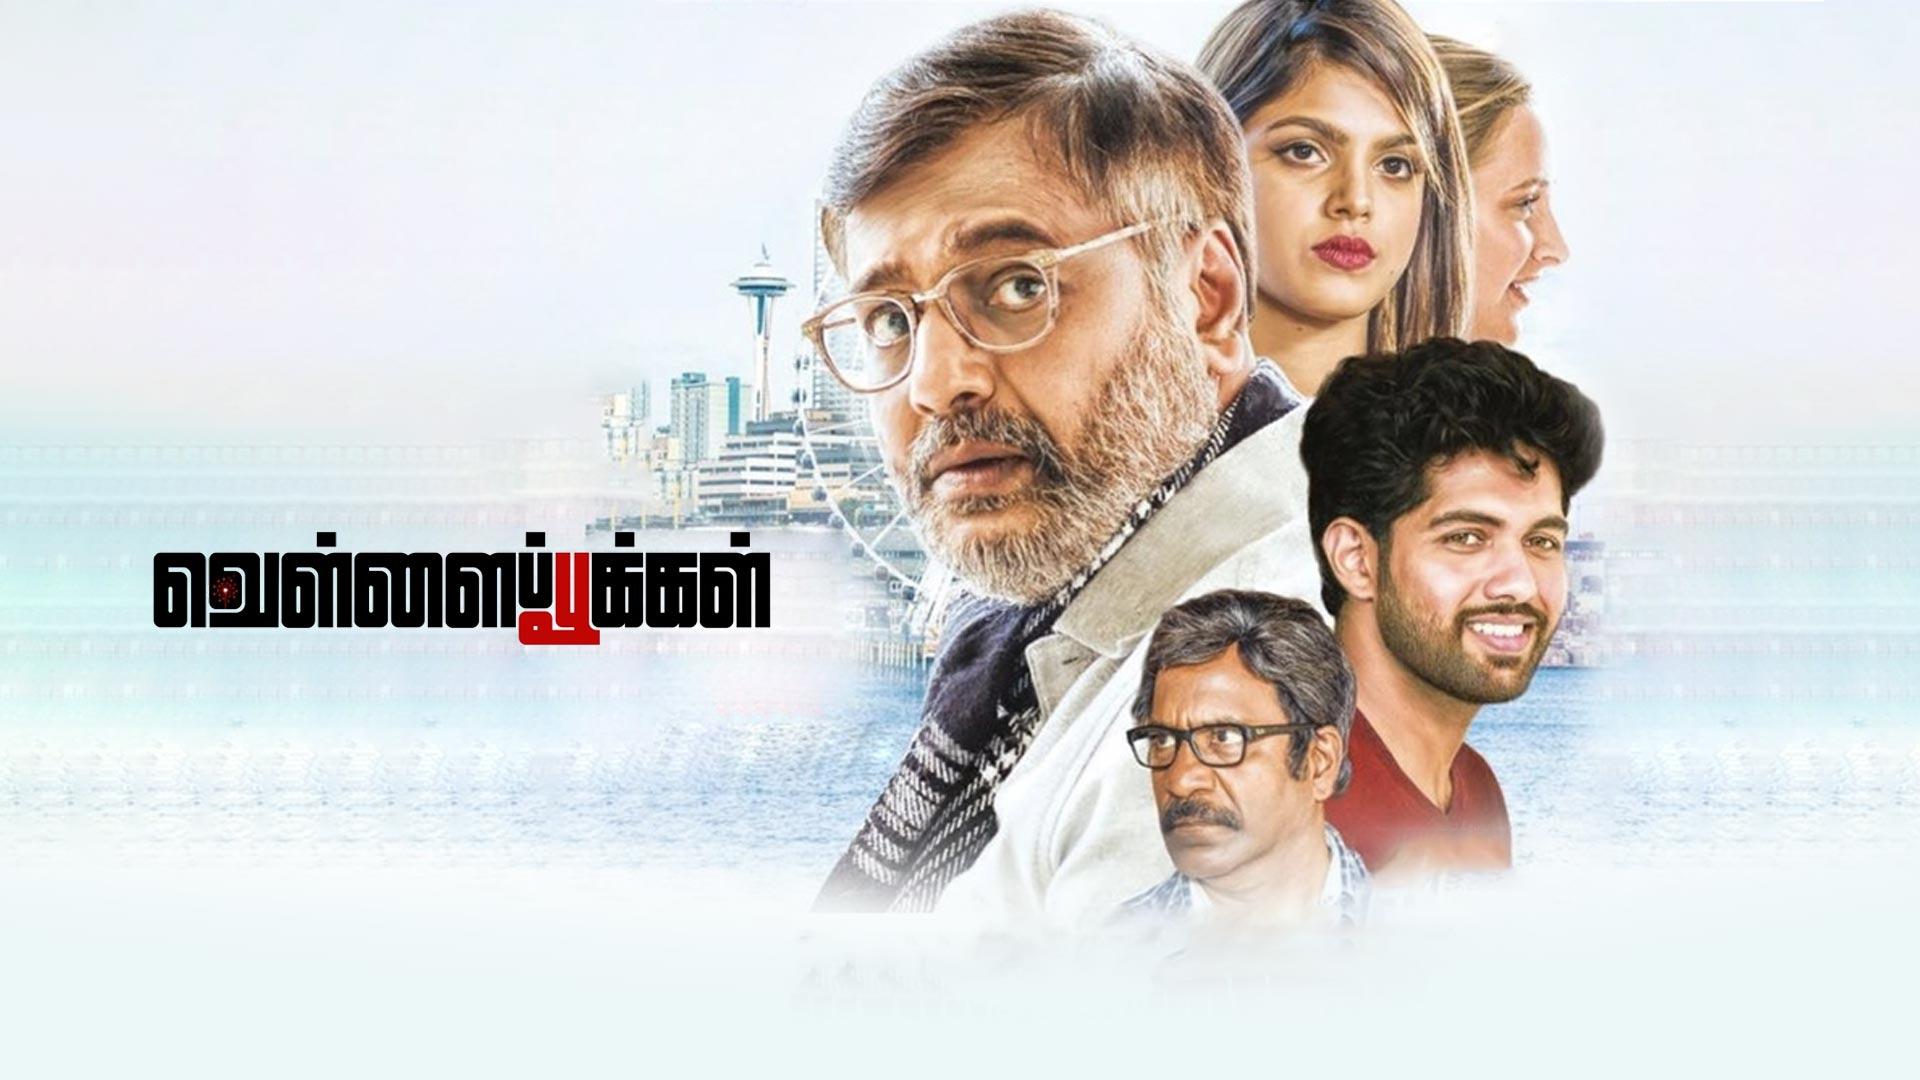 Ratsasan Full Movie Online Watch Ratsasan in Full HD Quality